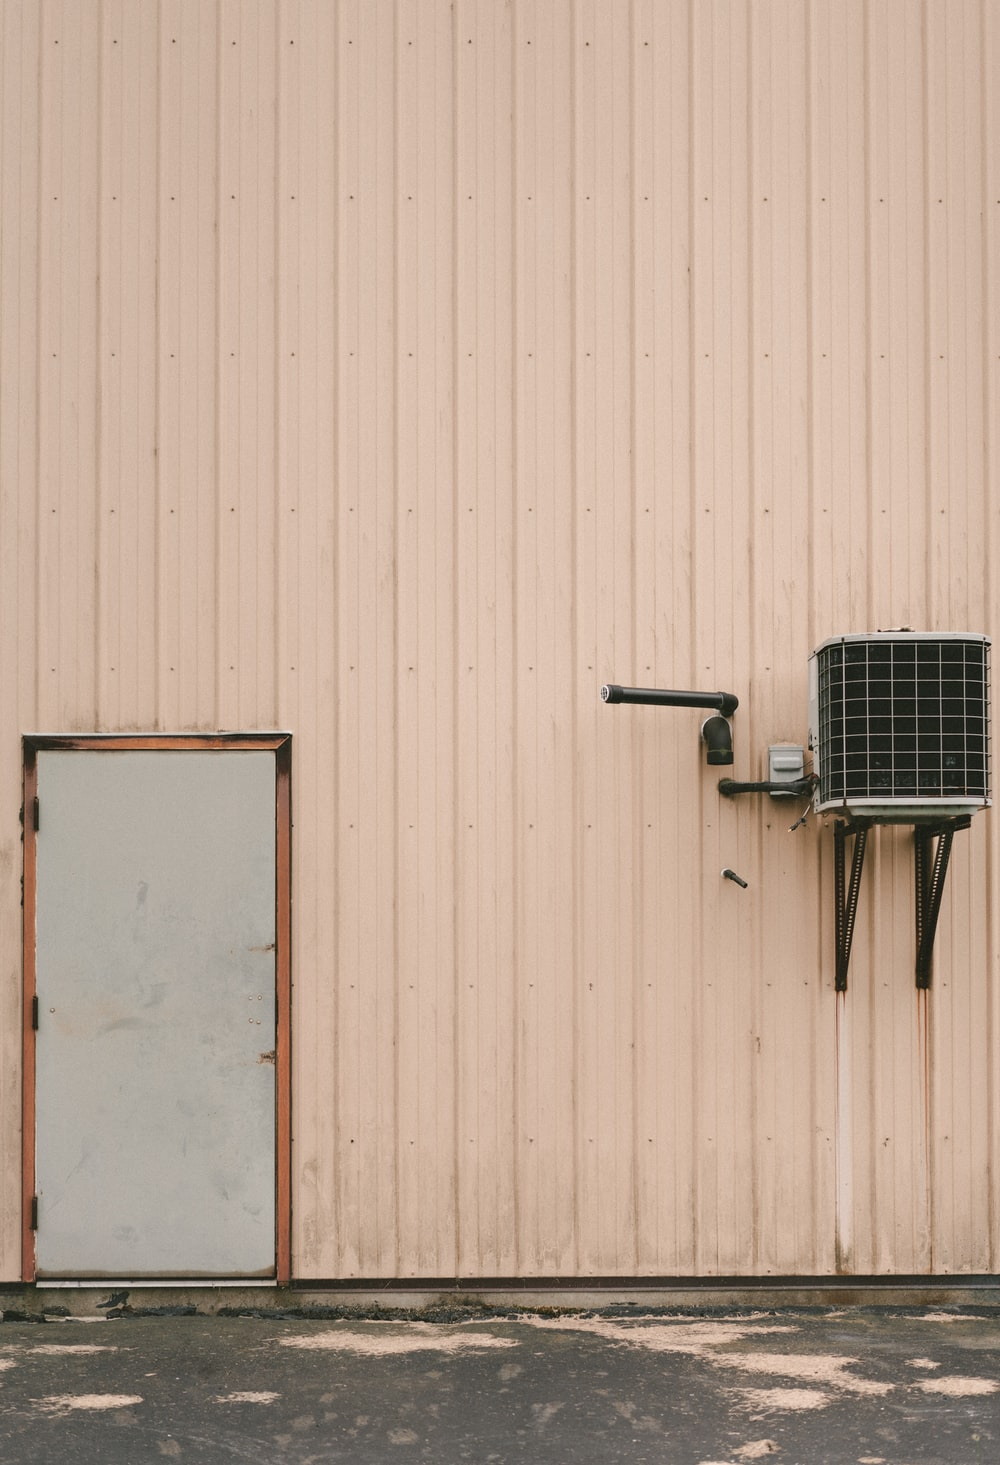 gray air condenser beside gray closed door